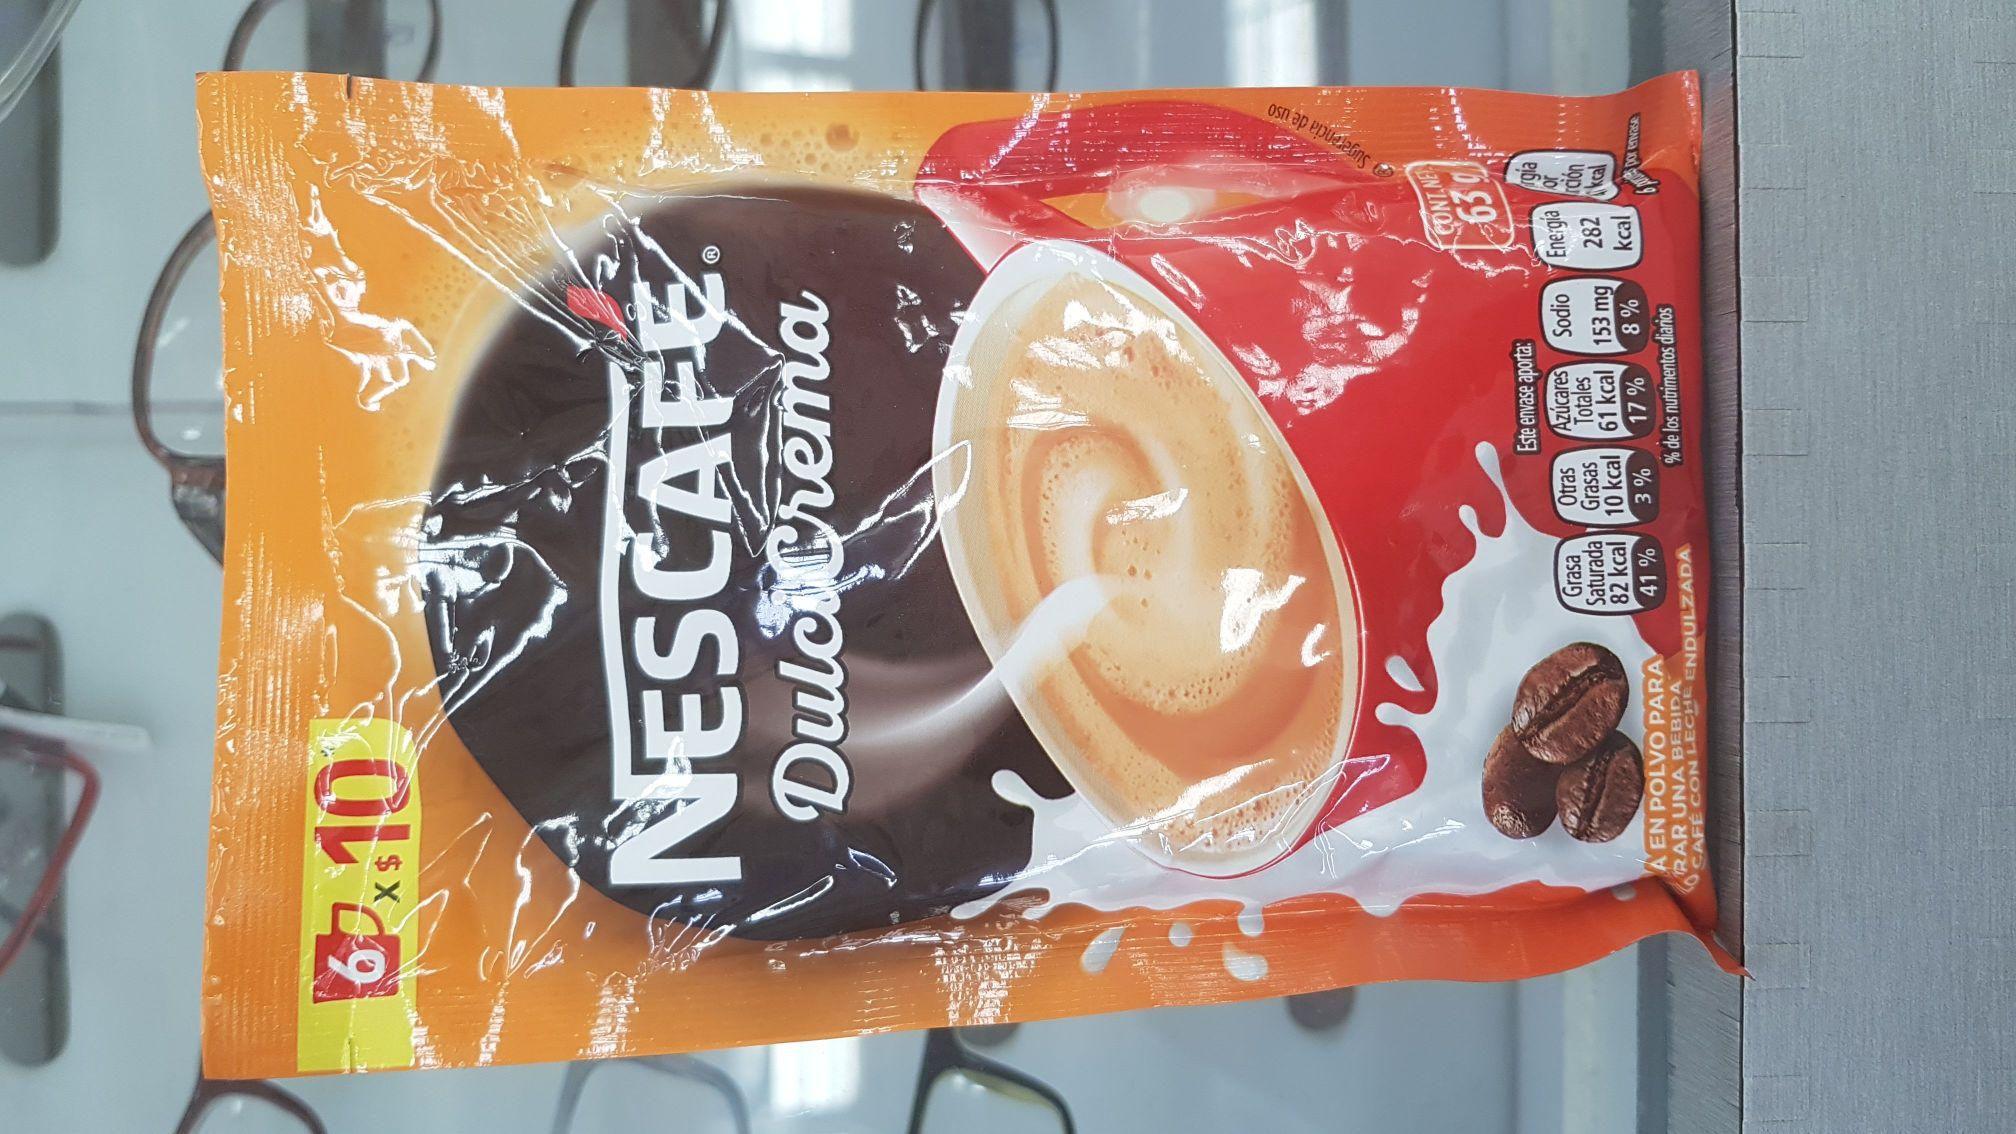 Chedraui: Nescafe dulcicrema a $2